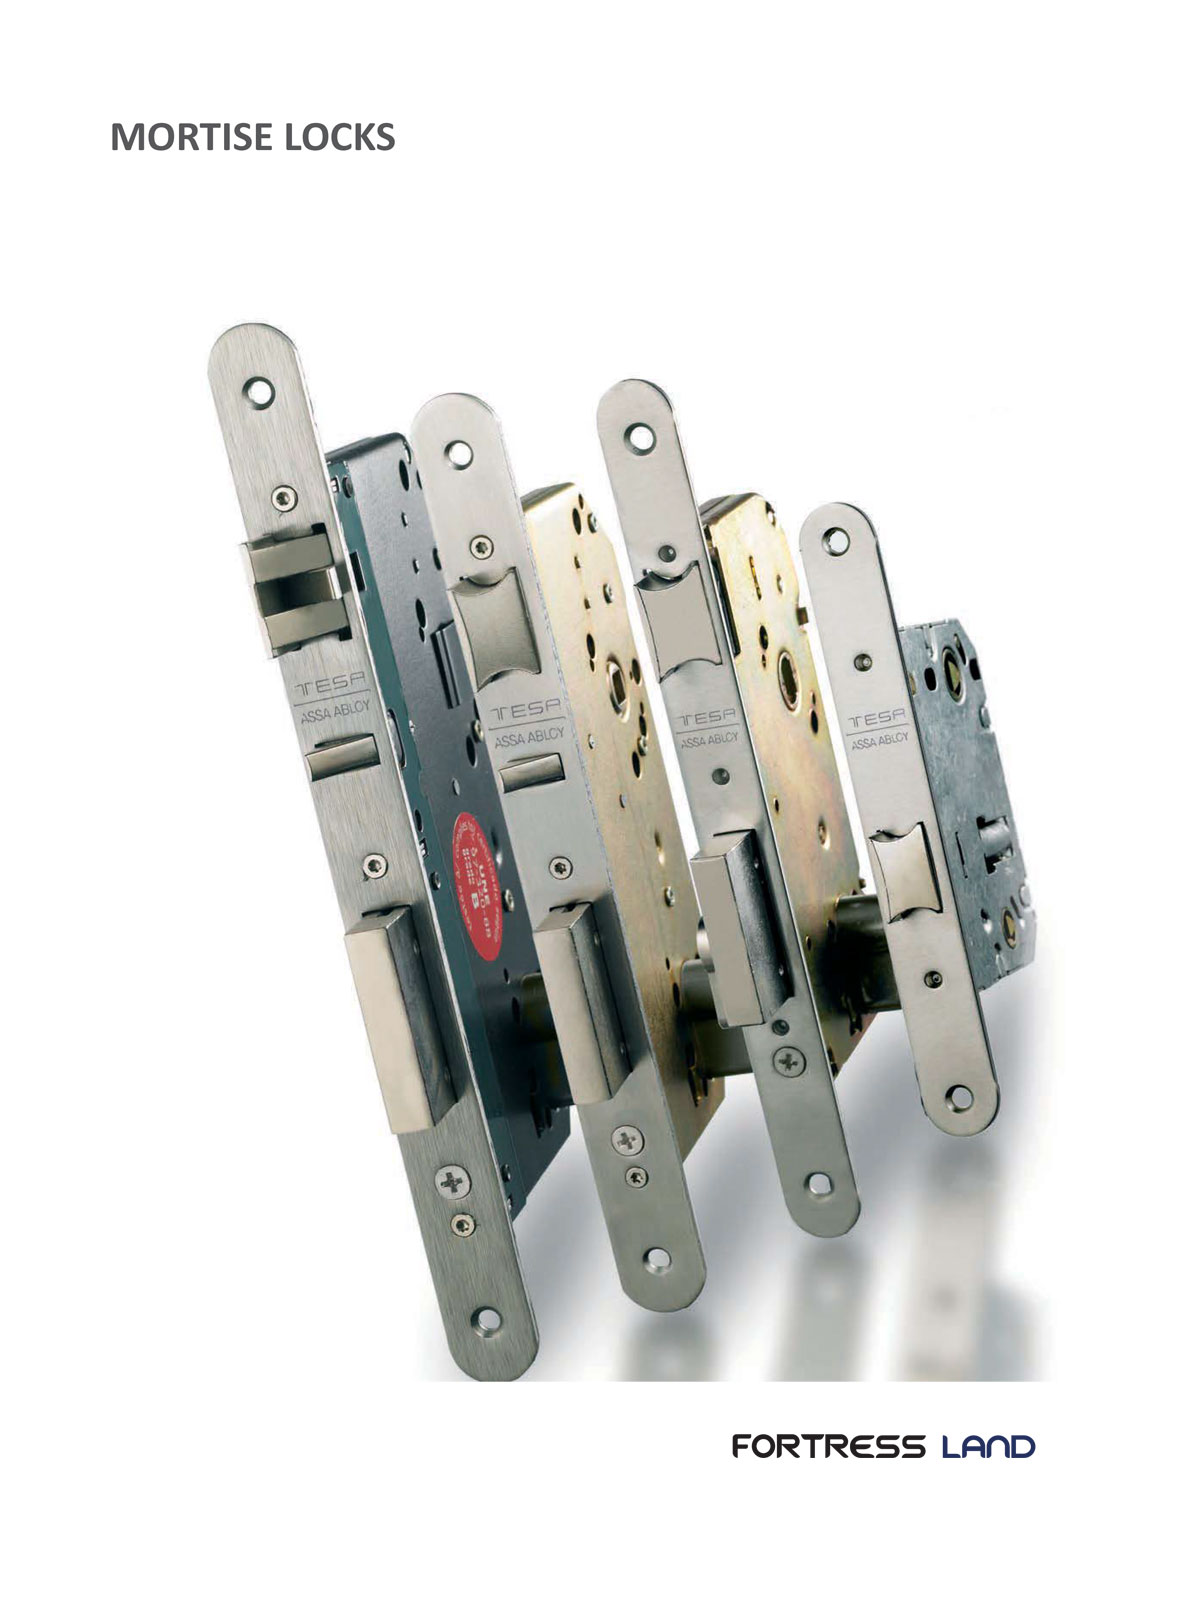 mortise lock, automatic deadlock, passage lock, deadbolt lock, latch lock, privacy lock, bath room lock, entrance lock, weather proof lock, Fortress Land Security Company